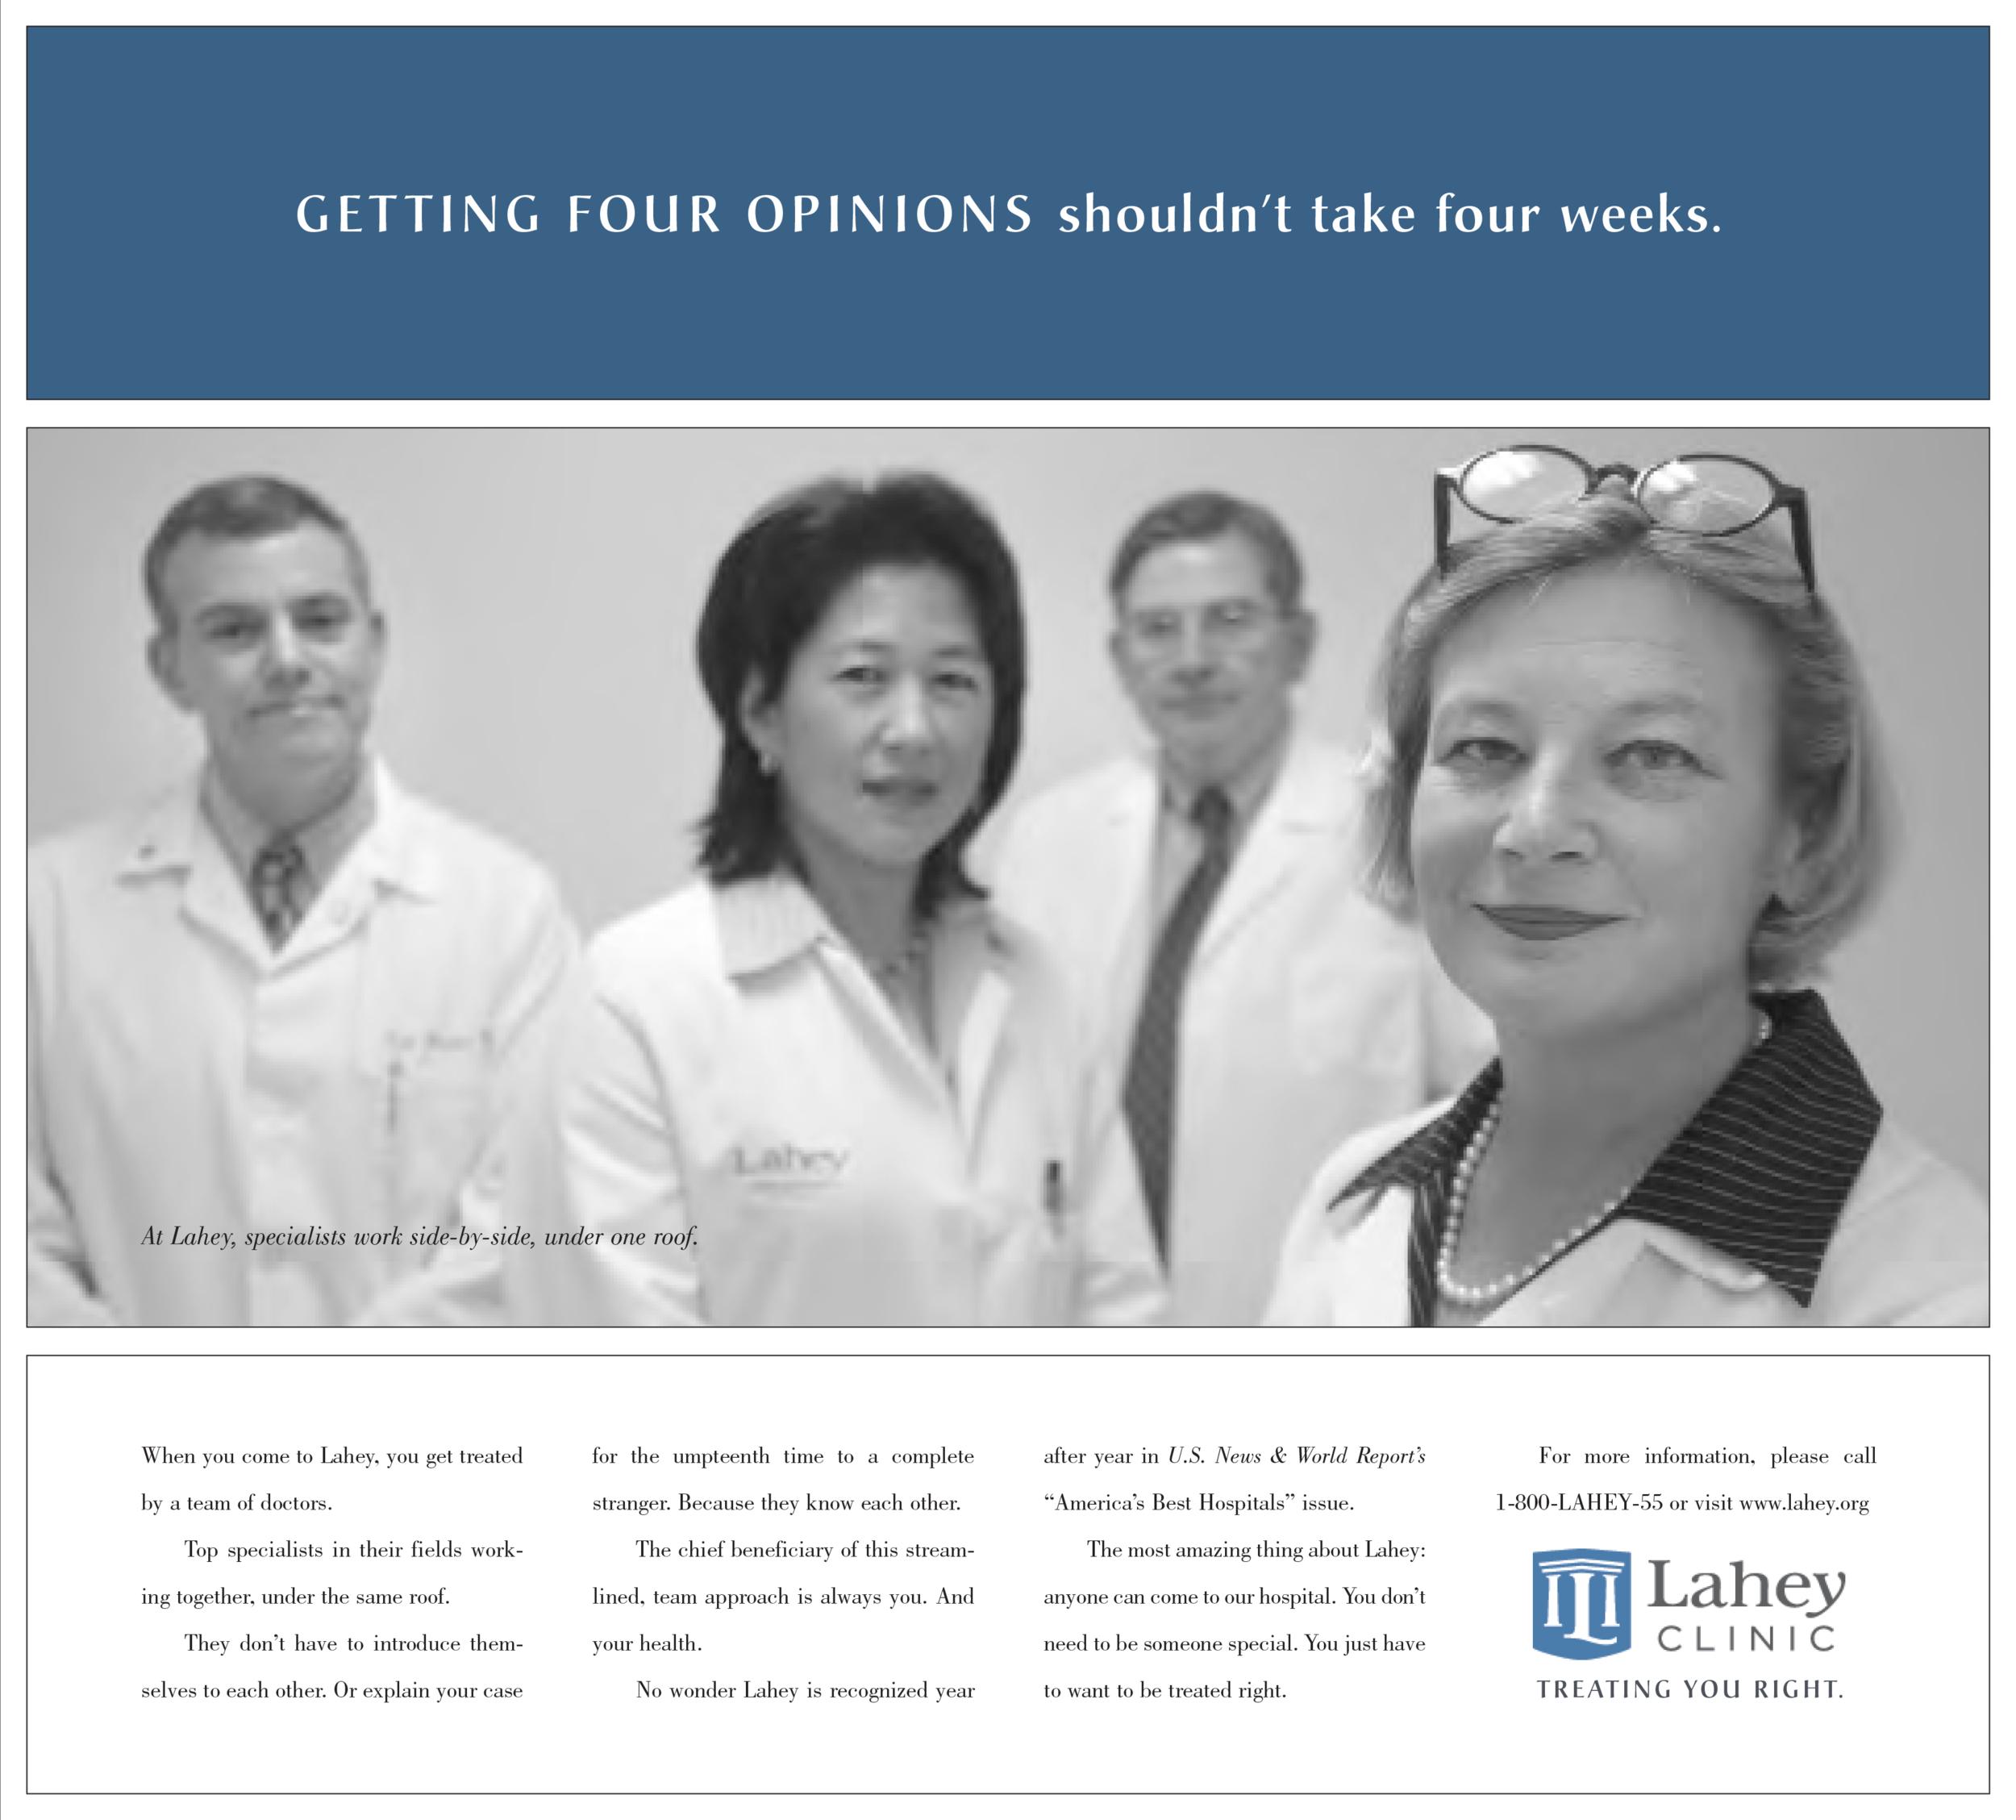 Lahey Bona Fide healthcare advertising team approach